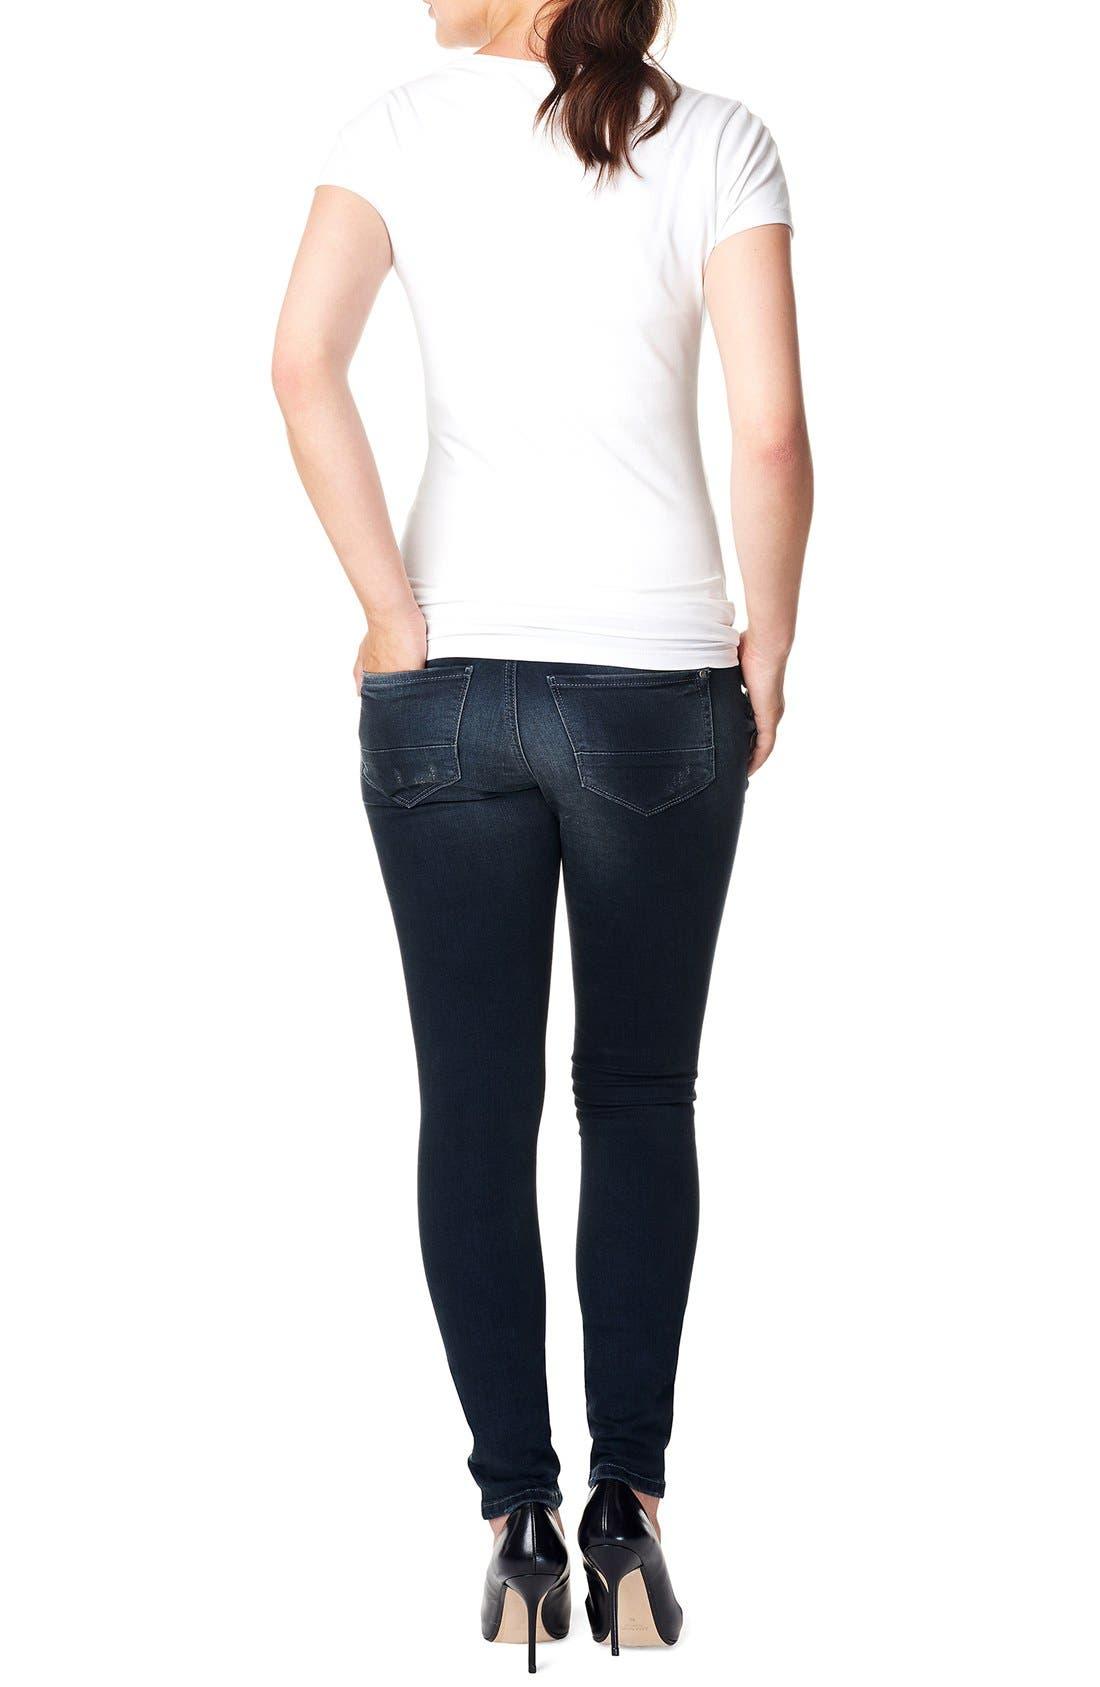 'Britt' Over the Belly Skinny Maternity Jeans,                             Alternate thumbnail 2, color,                             DARK STONE WASH